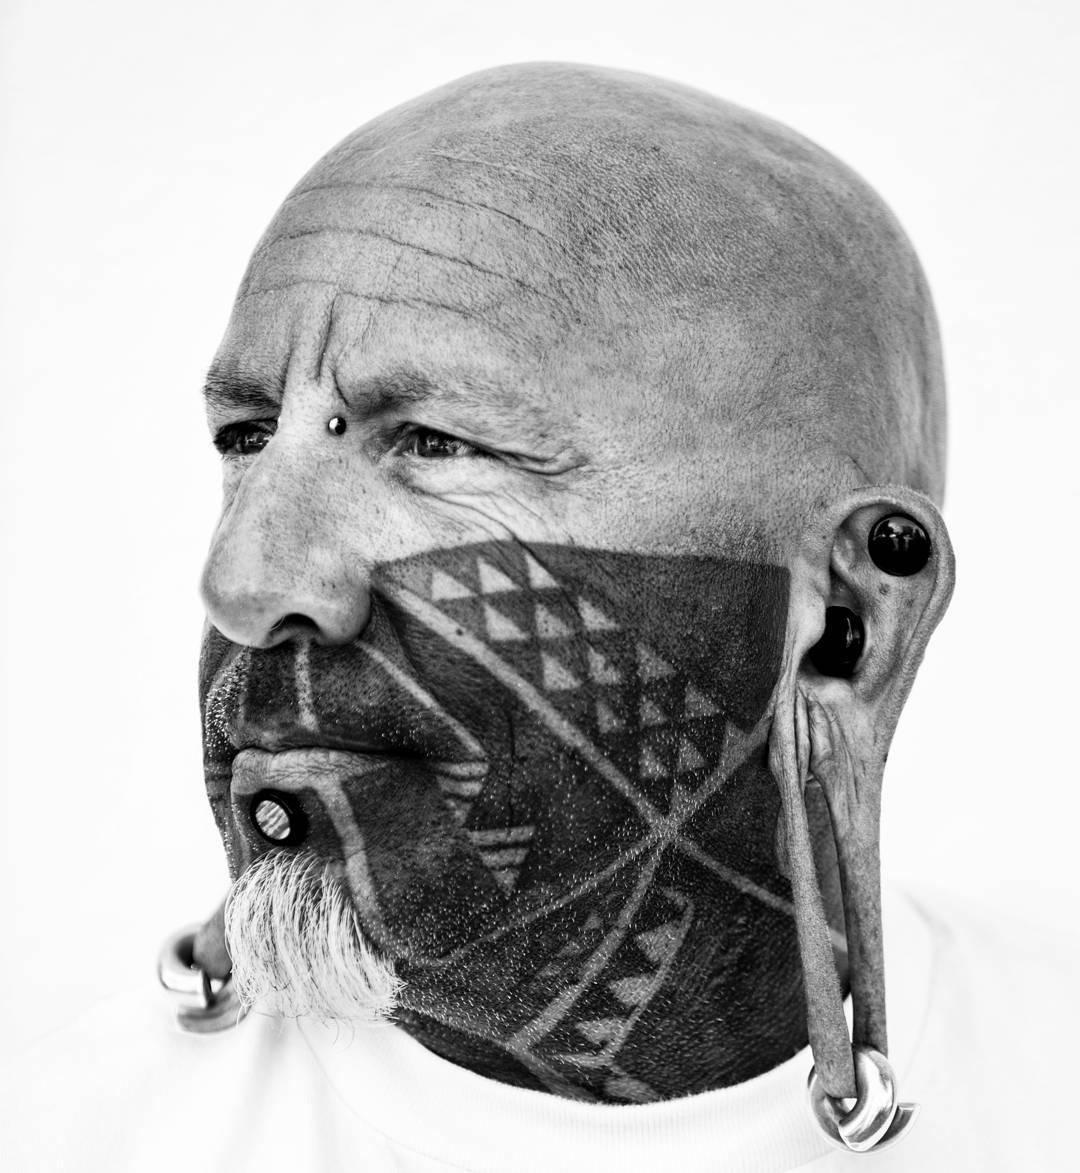 0fef68aad 65+ Best Face Tattoo Designs & Ideas - Enjoy Yourself (2019)